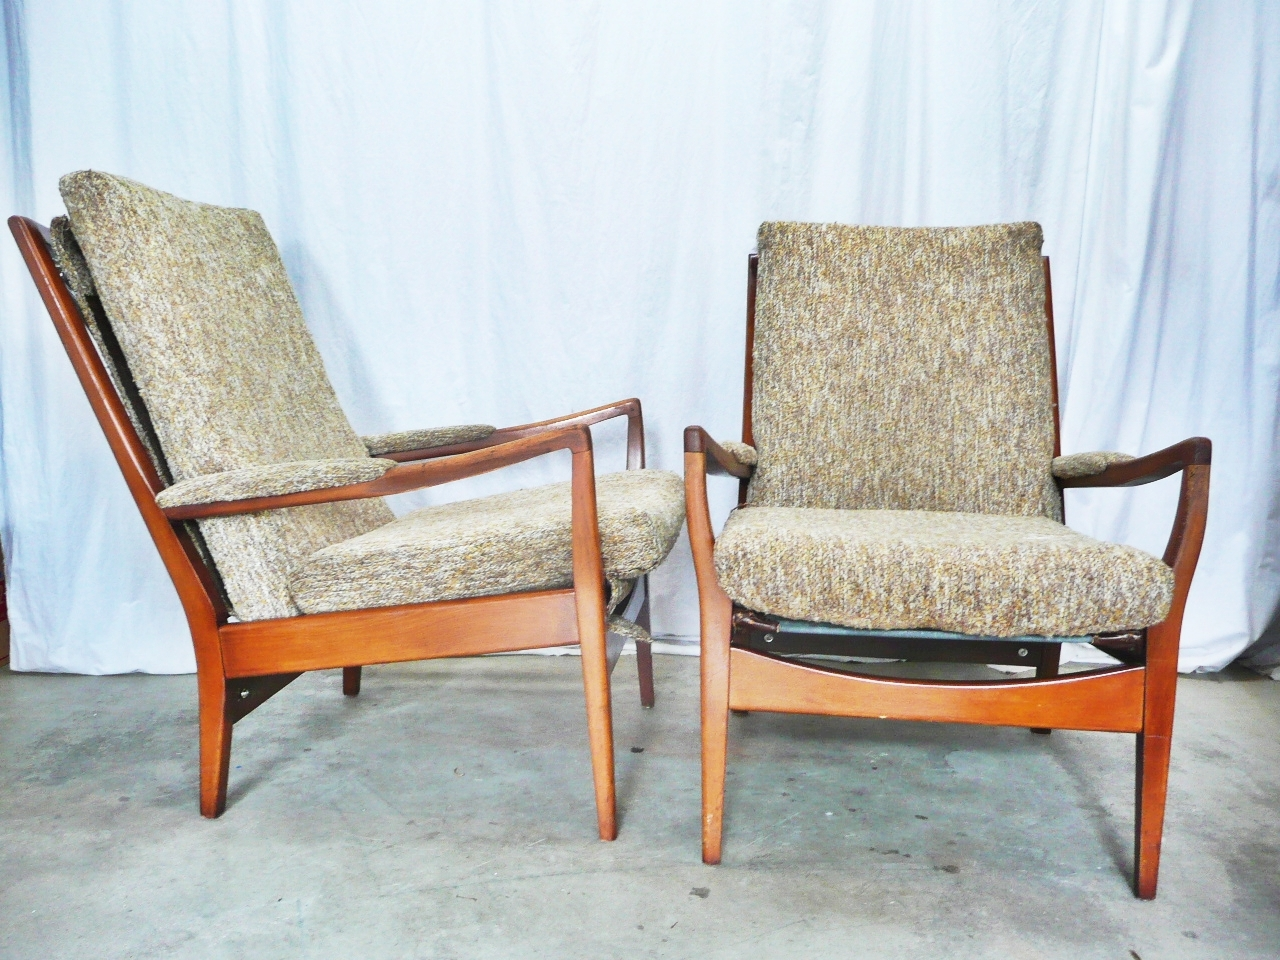 vintage retro 1959 cintique c5 deluxe group chair mid century. Black Bedroom Furniture Sets. Home Design Ideas